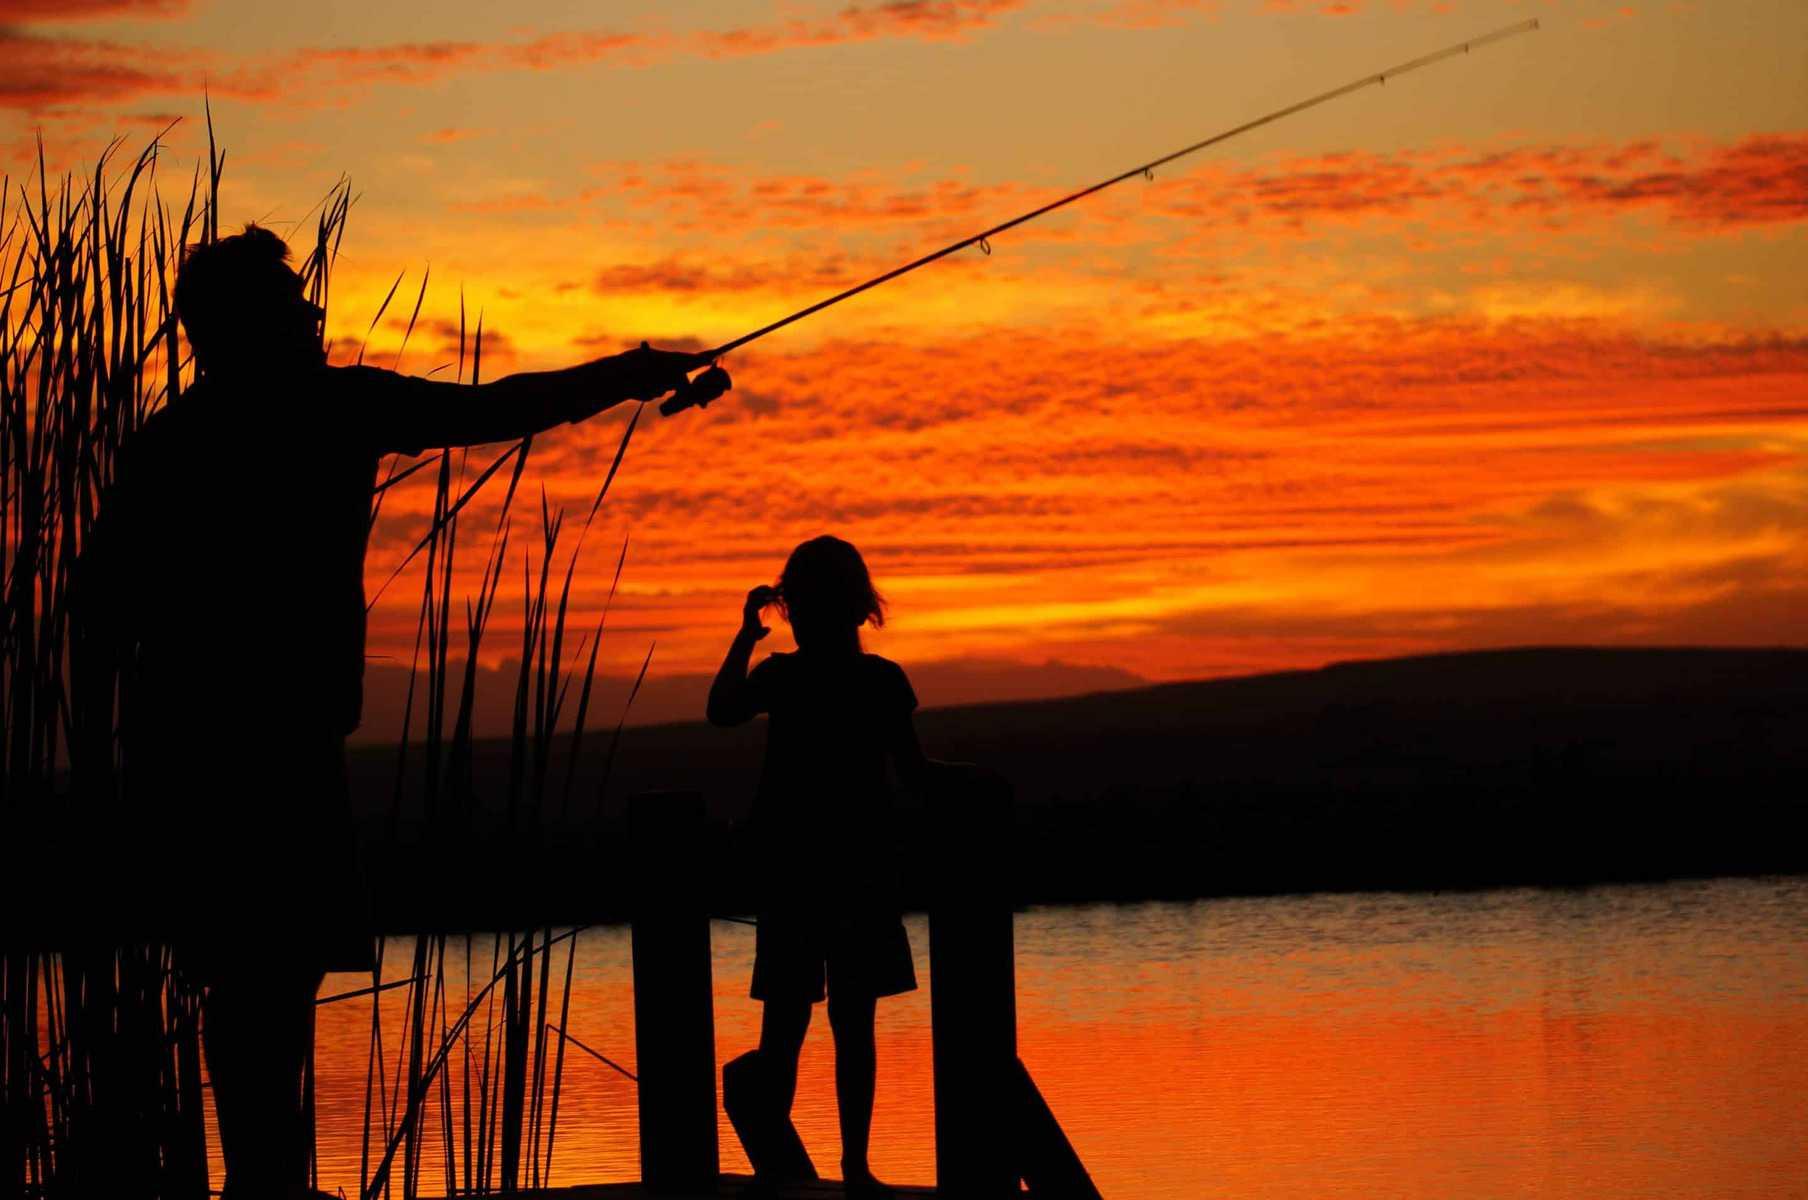 Picnics and fishing